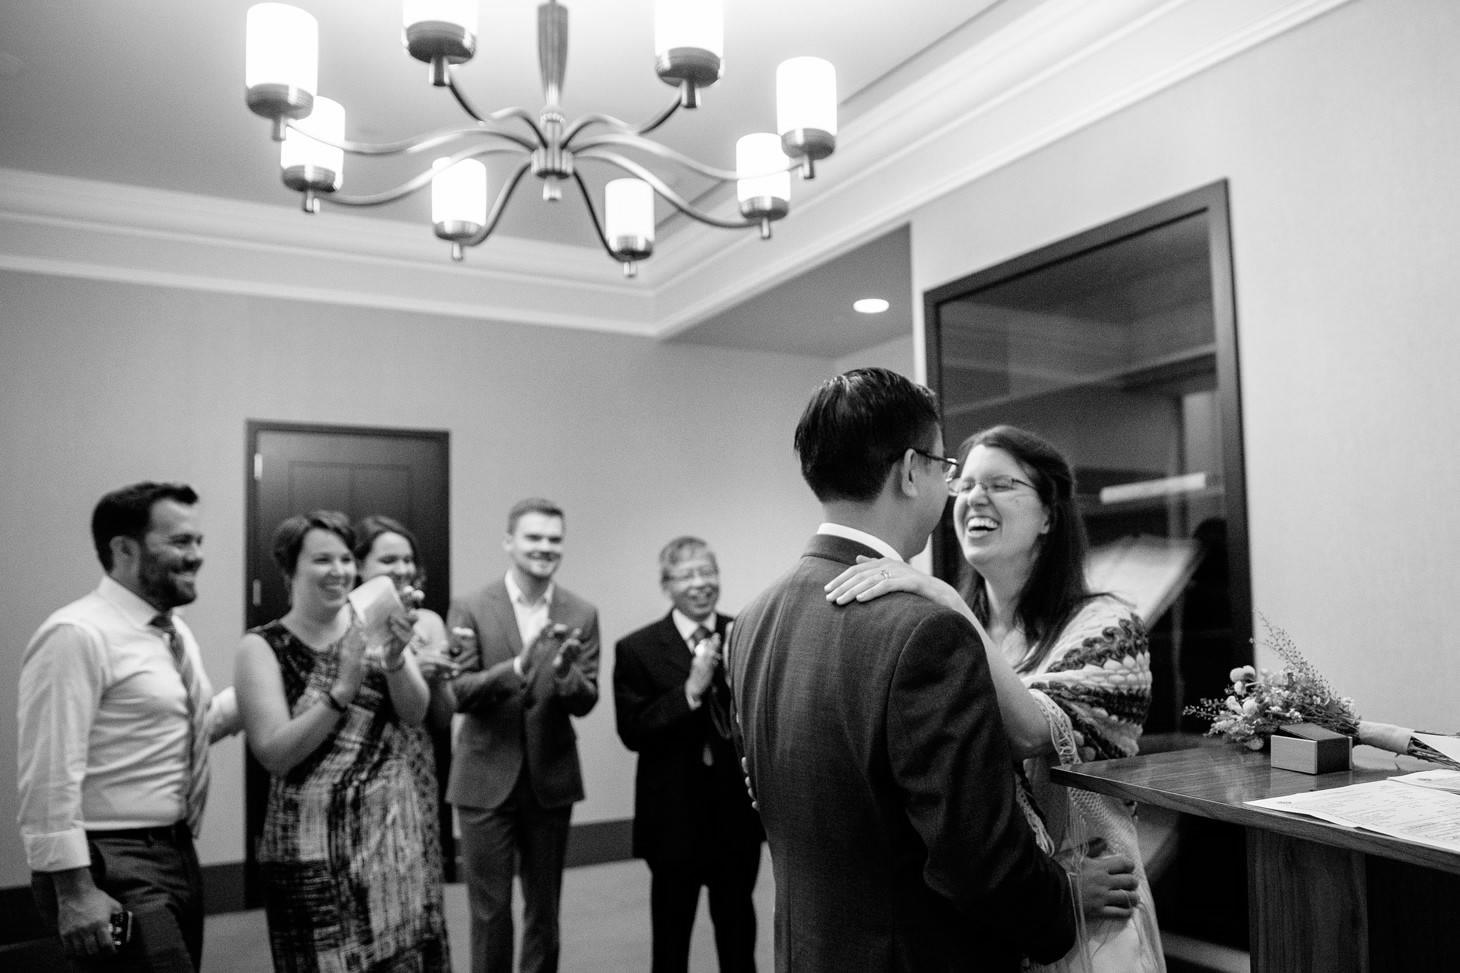 028-nyc-wedding-photographer-smitten-chickens-elope-nyc-city-hall-fall.jpg